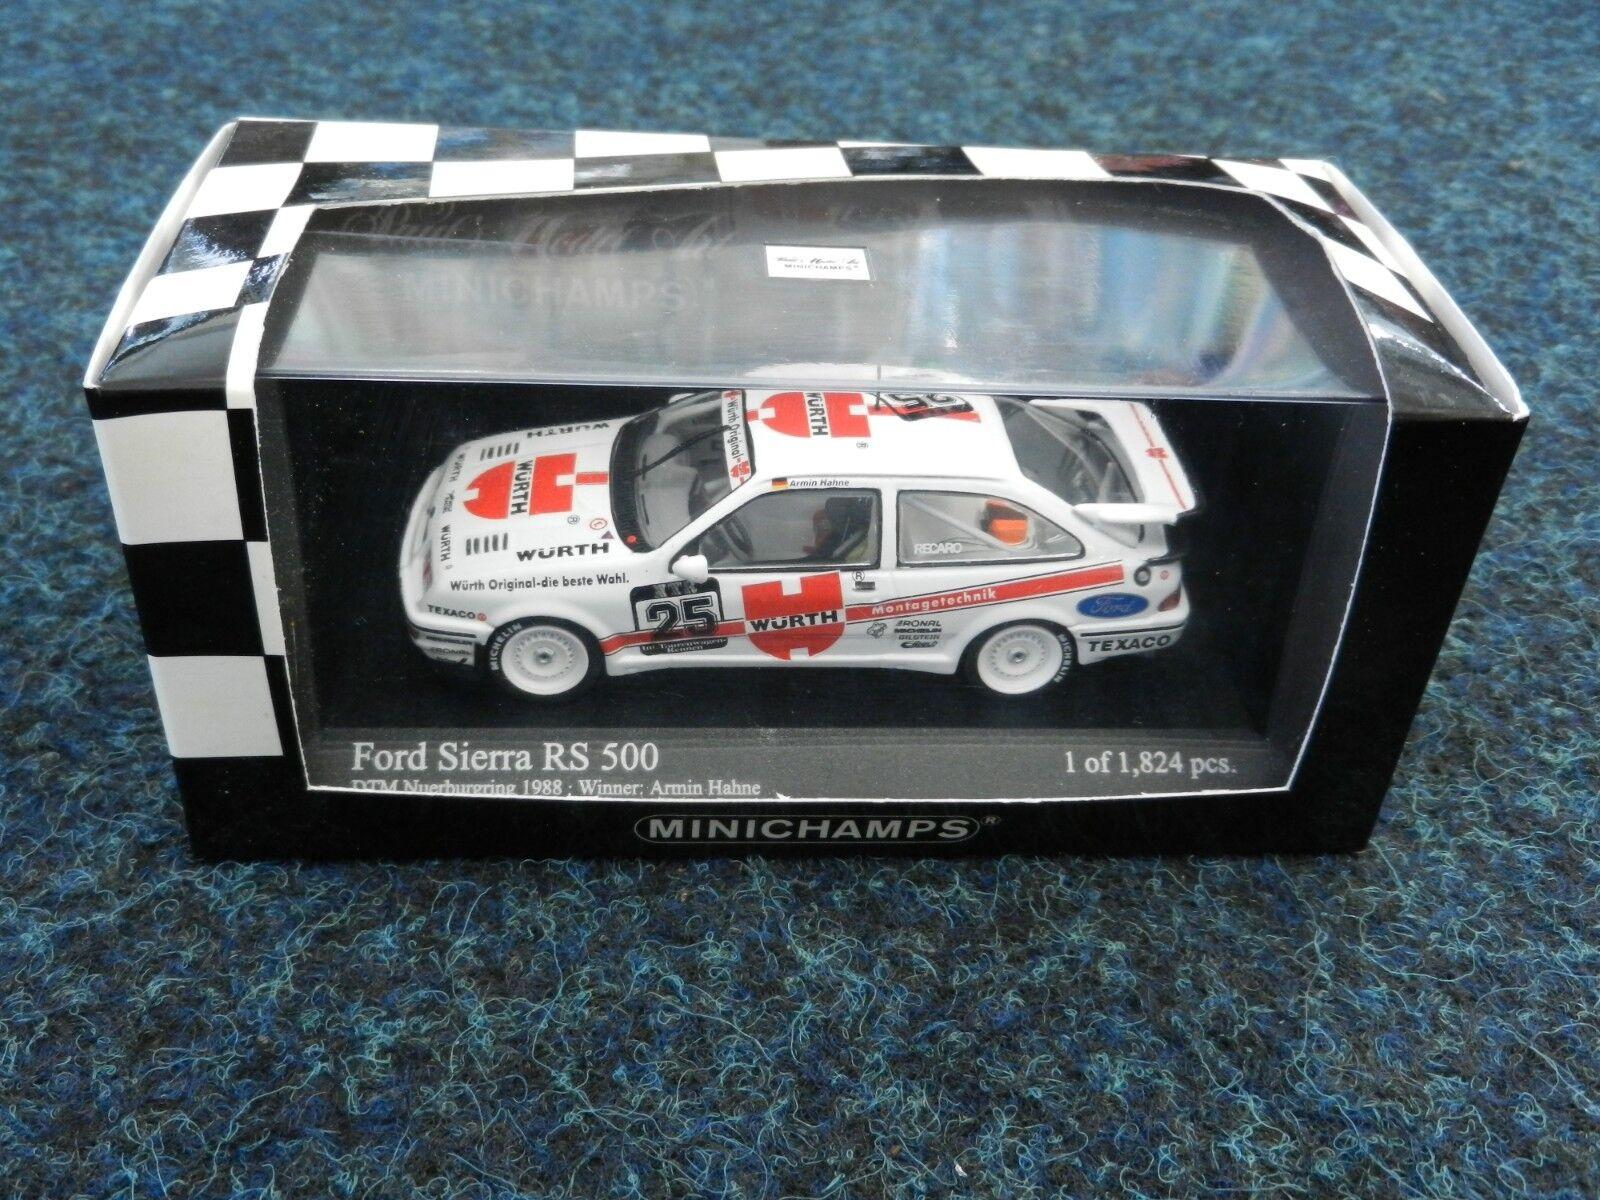 Raro Minichamps 1 43 Wurth RS500 DTM Sierra RS Cosworth 430888025 en caja.